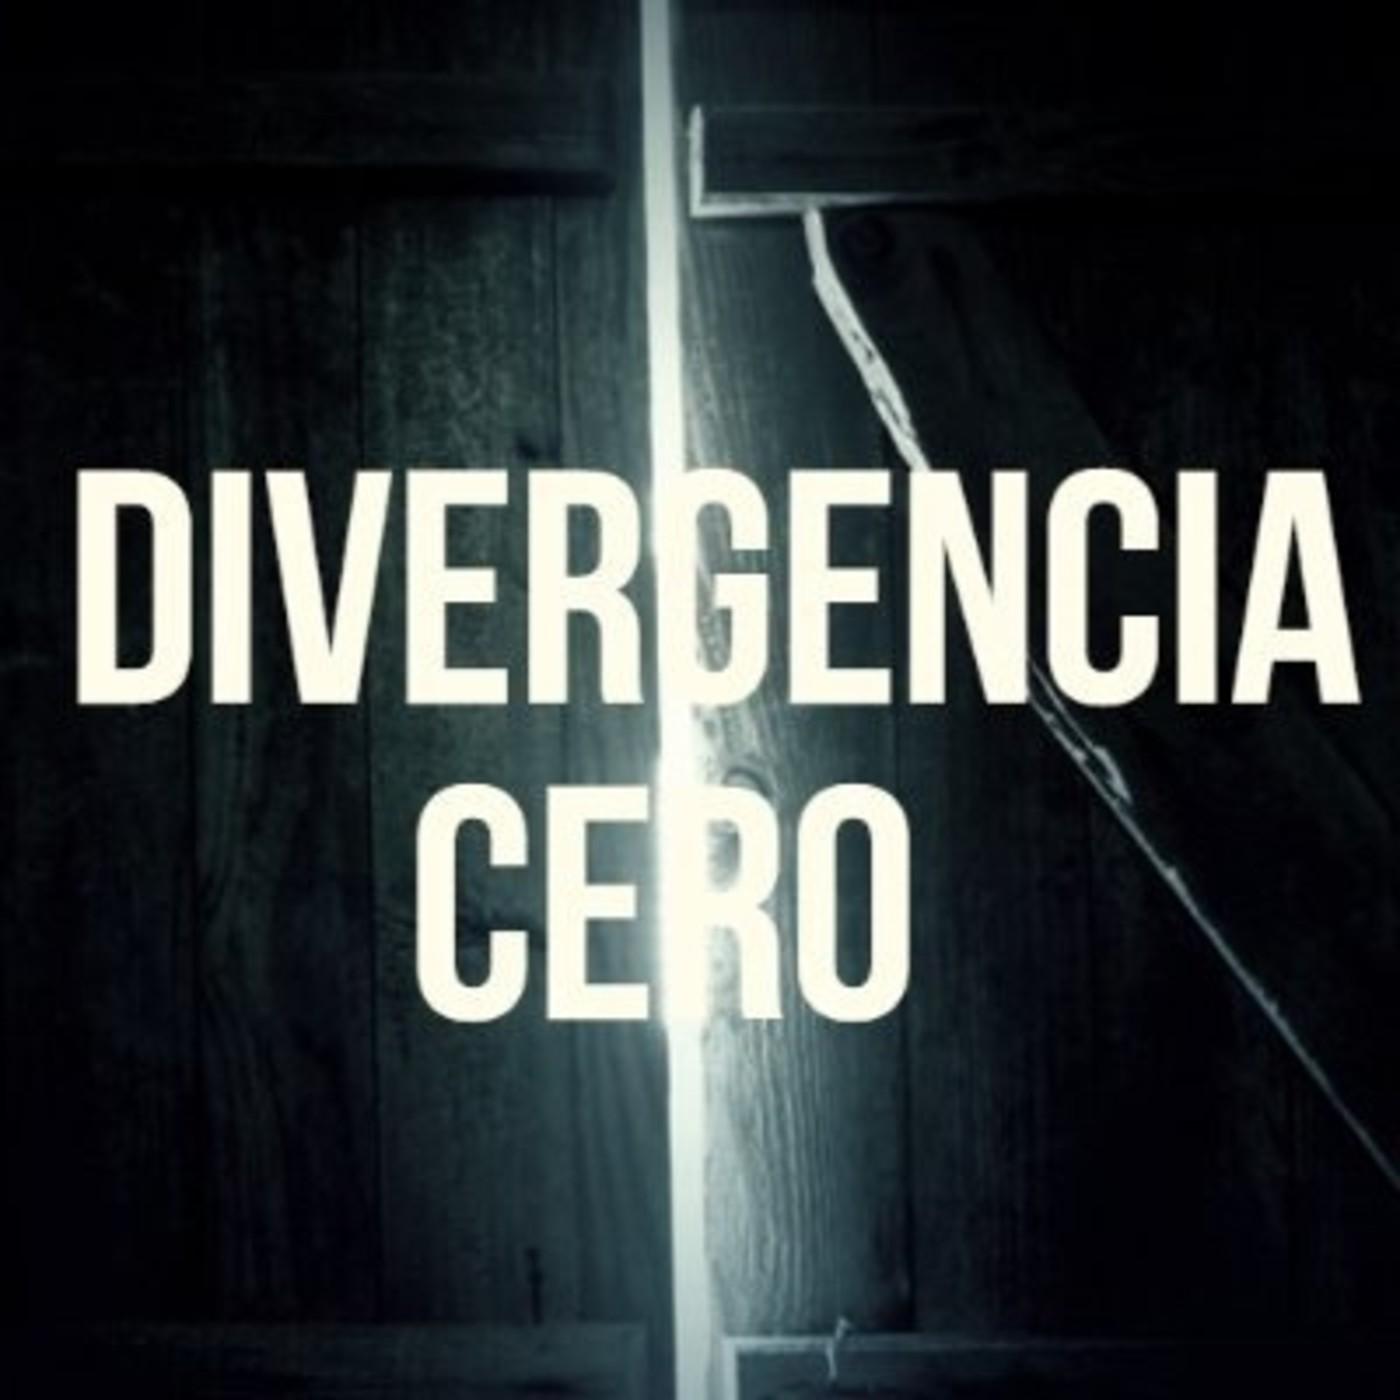 Microdivergencia - MIEDO, de Marc R. Soto